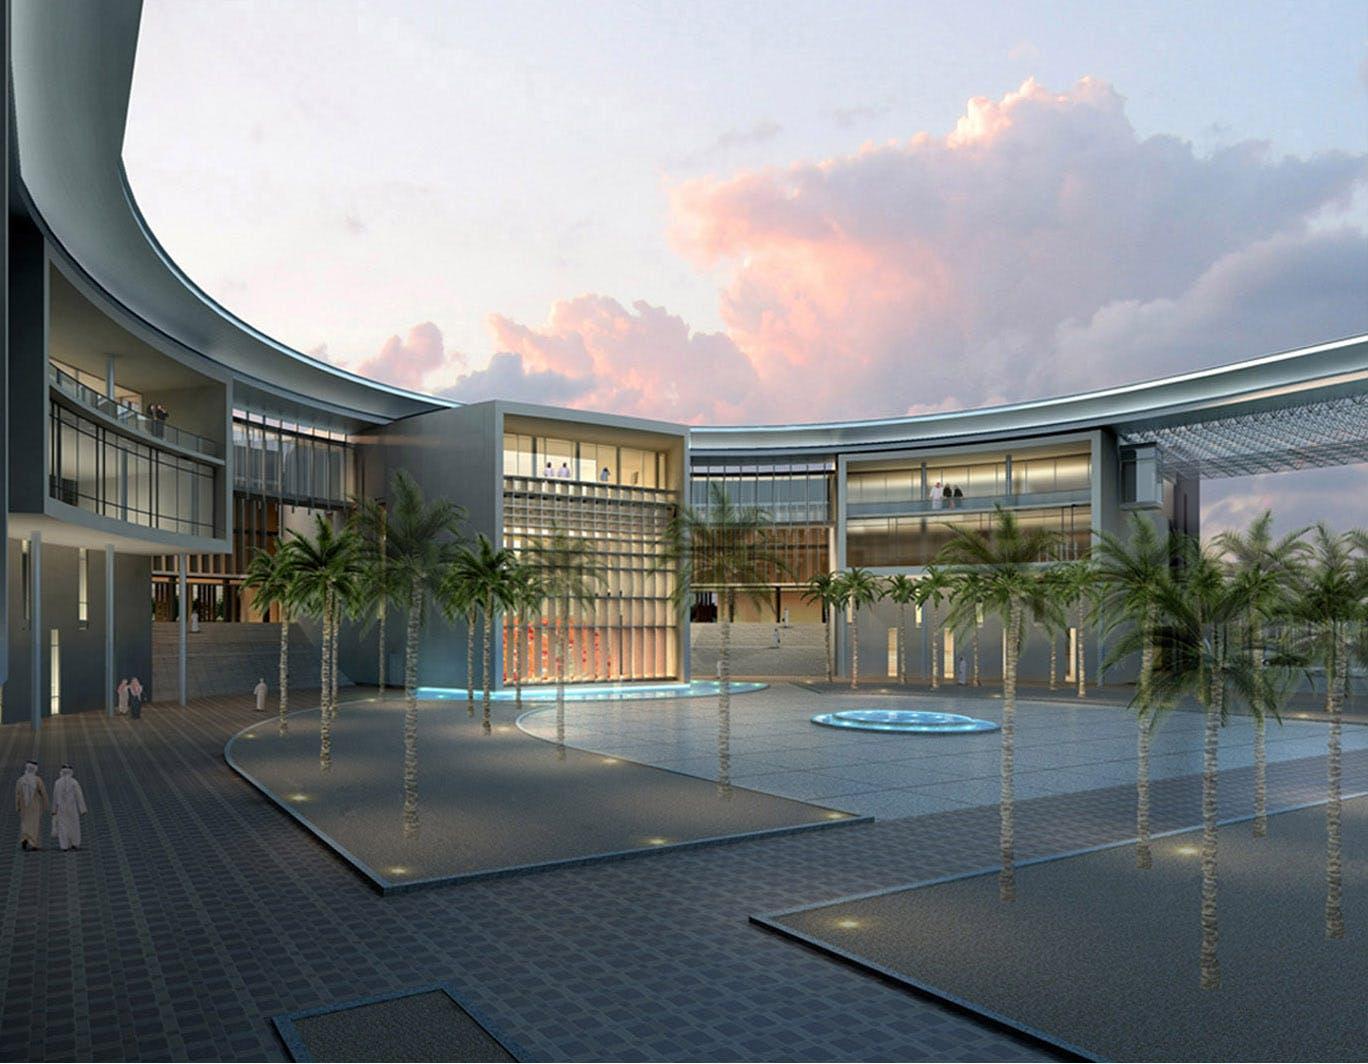 King Saud Bin Abdul Aziz University For Health Sciences